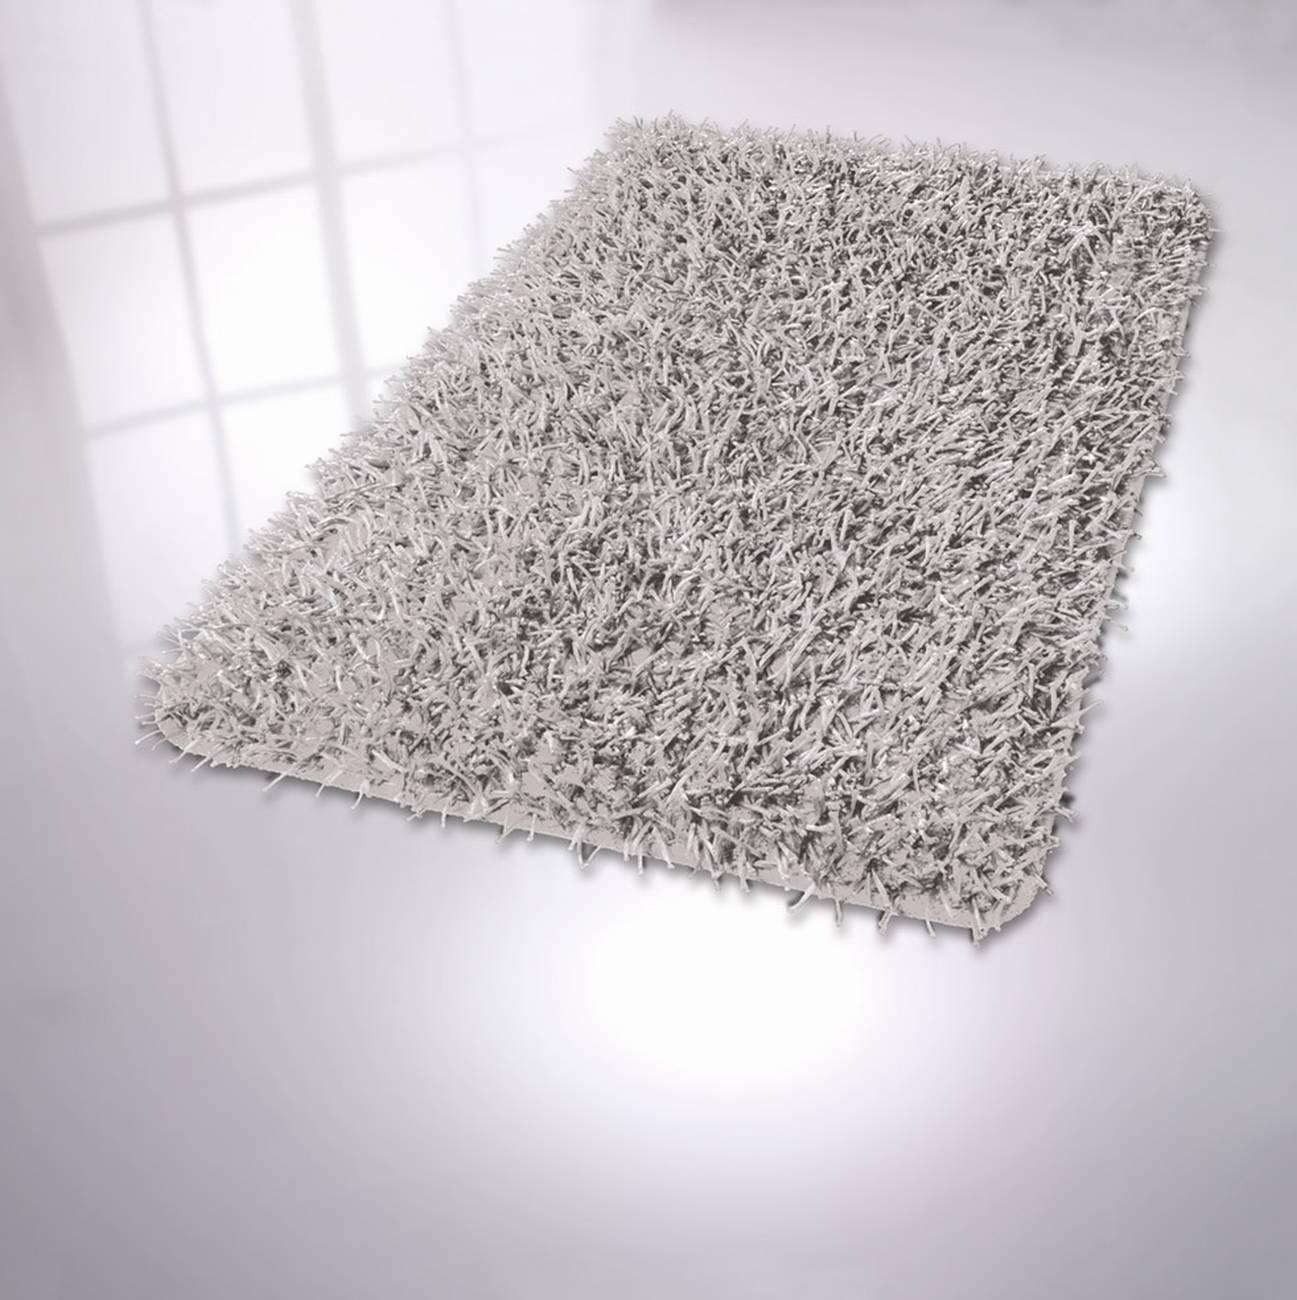 Badteppich Riva 75 % Polyester / 25 % Polyacryl Silbergrau 60x100 cm